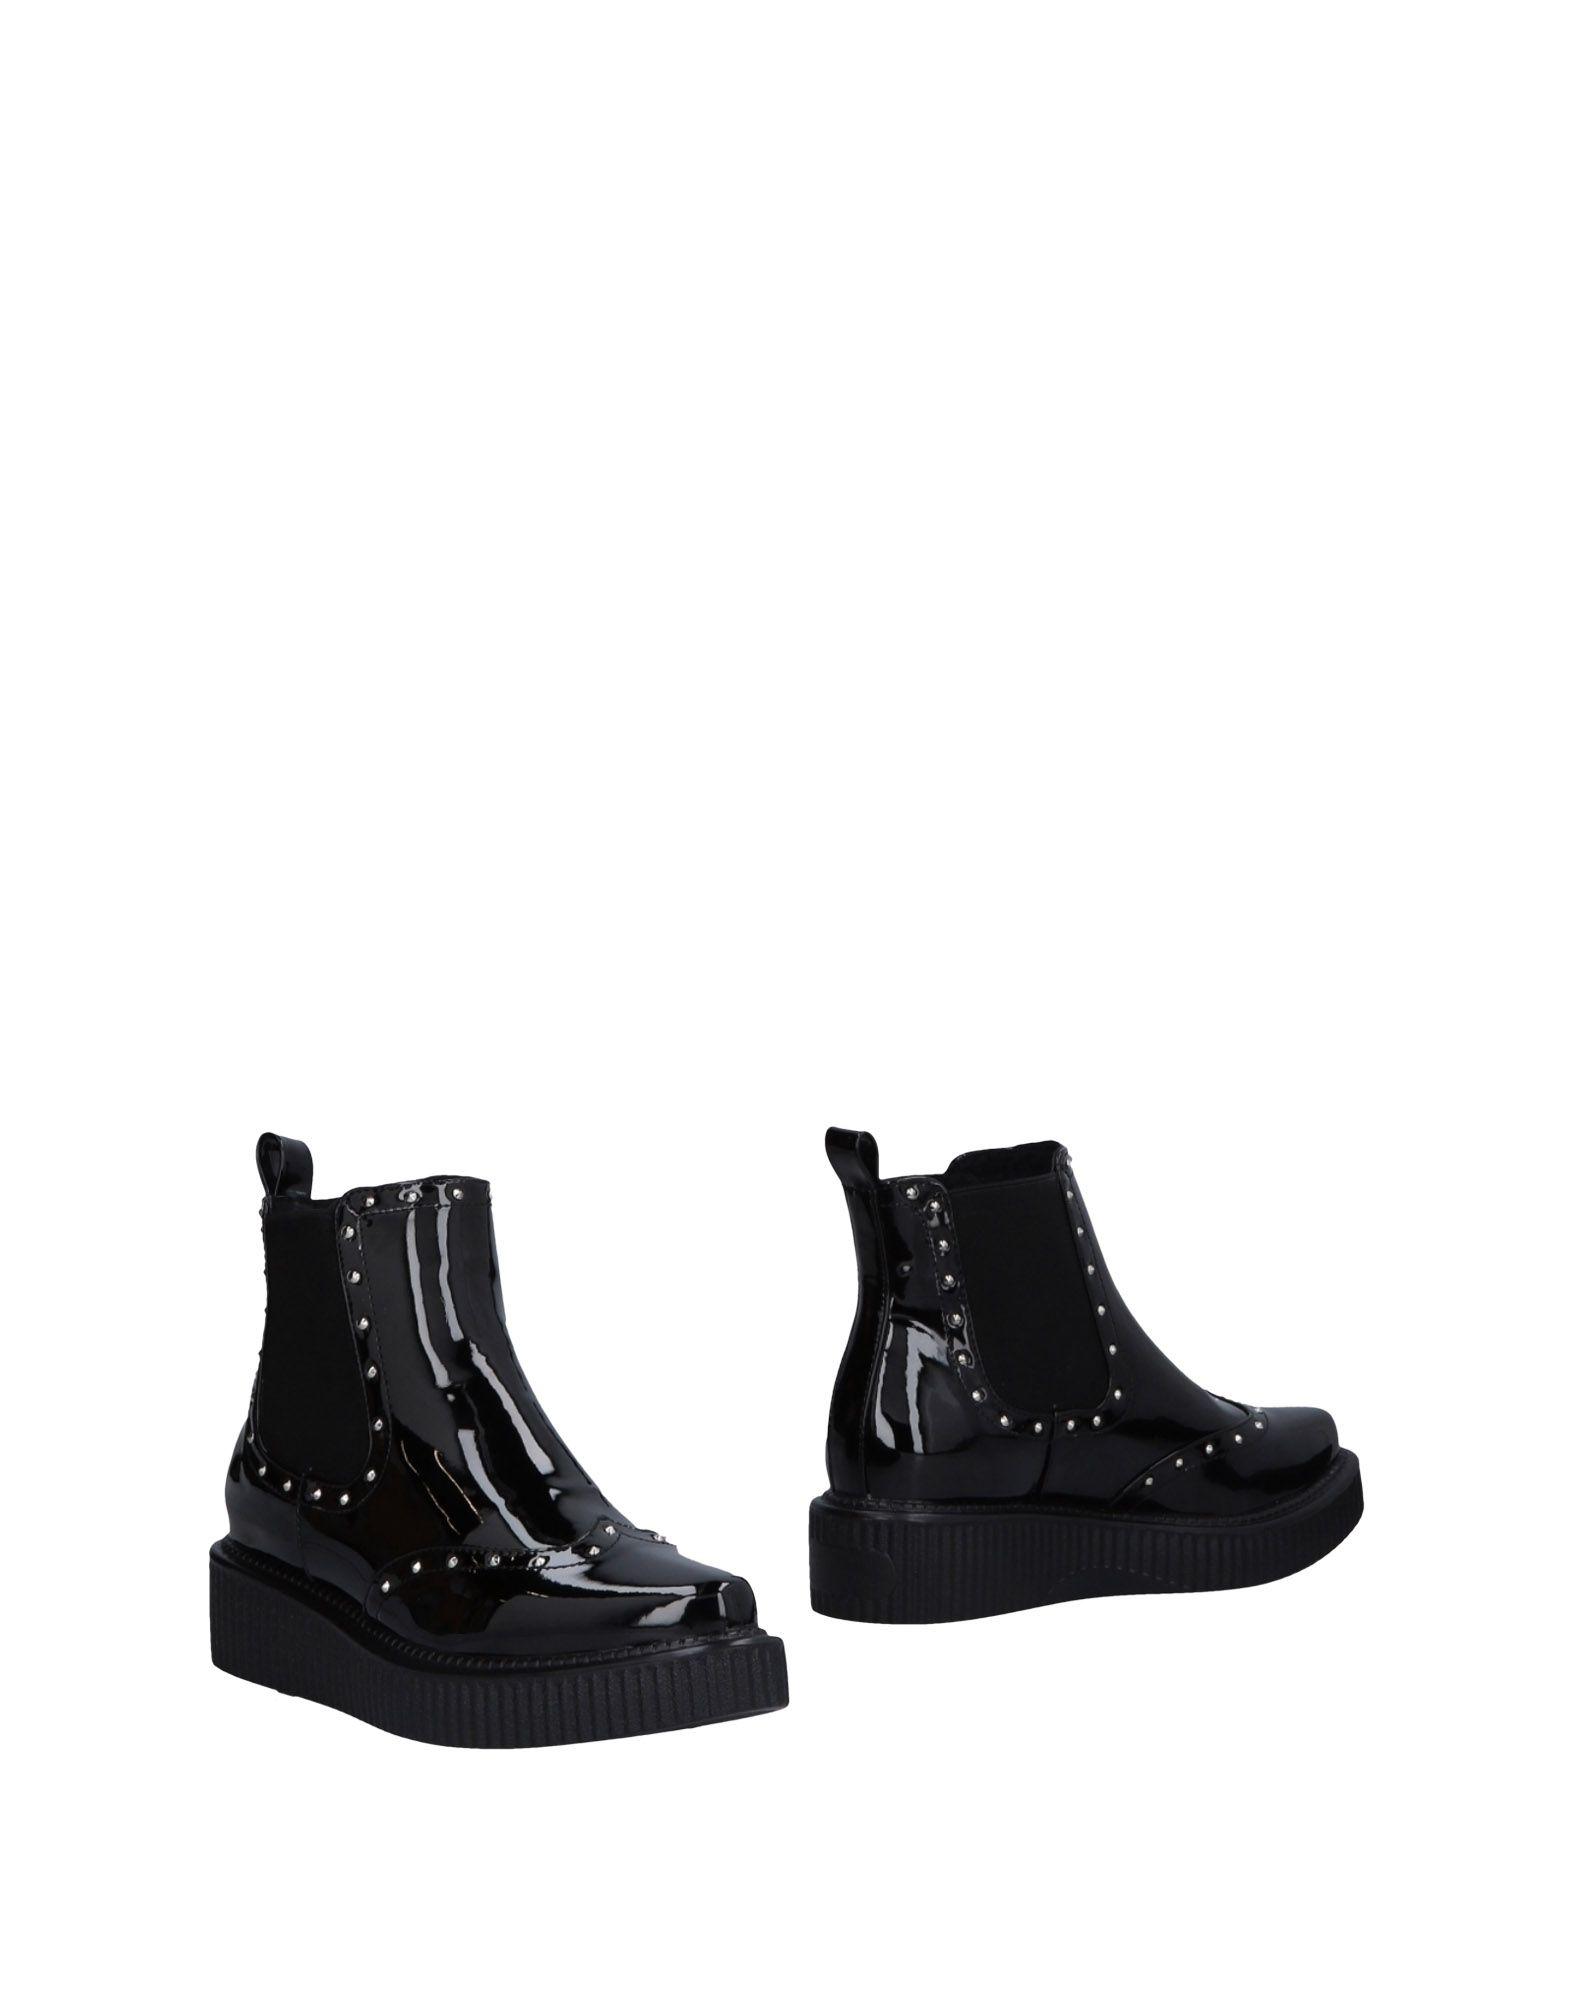 67 Sixtyseven Chelsea Boots Damen  11476269KI Gute Qualität beliebte Schuhe